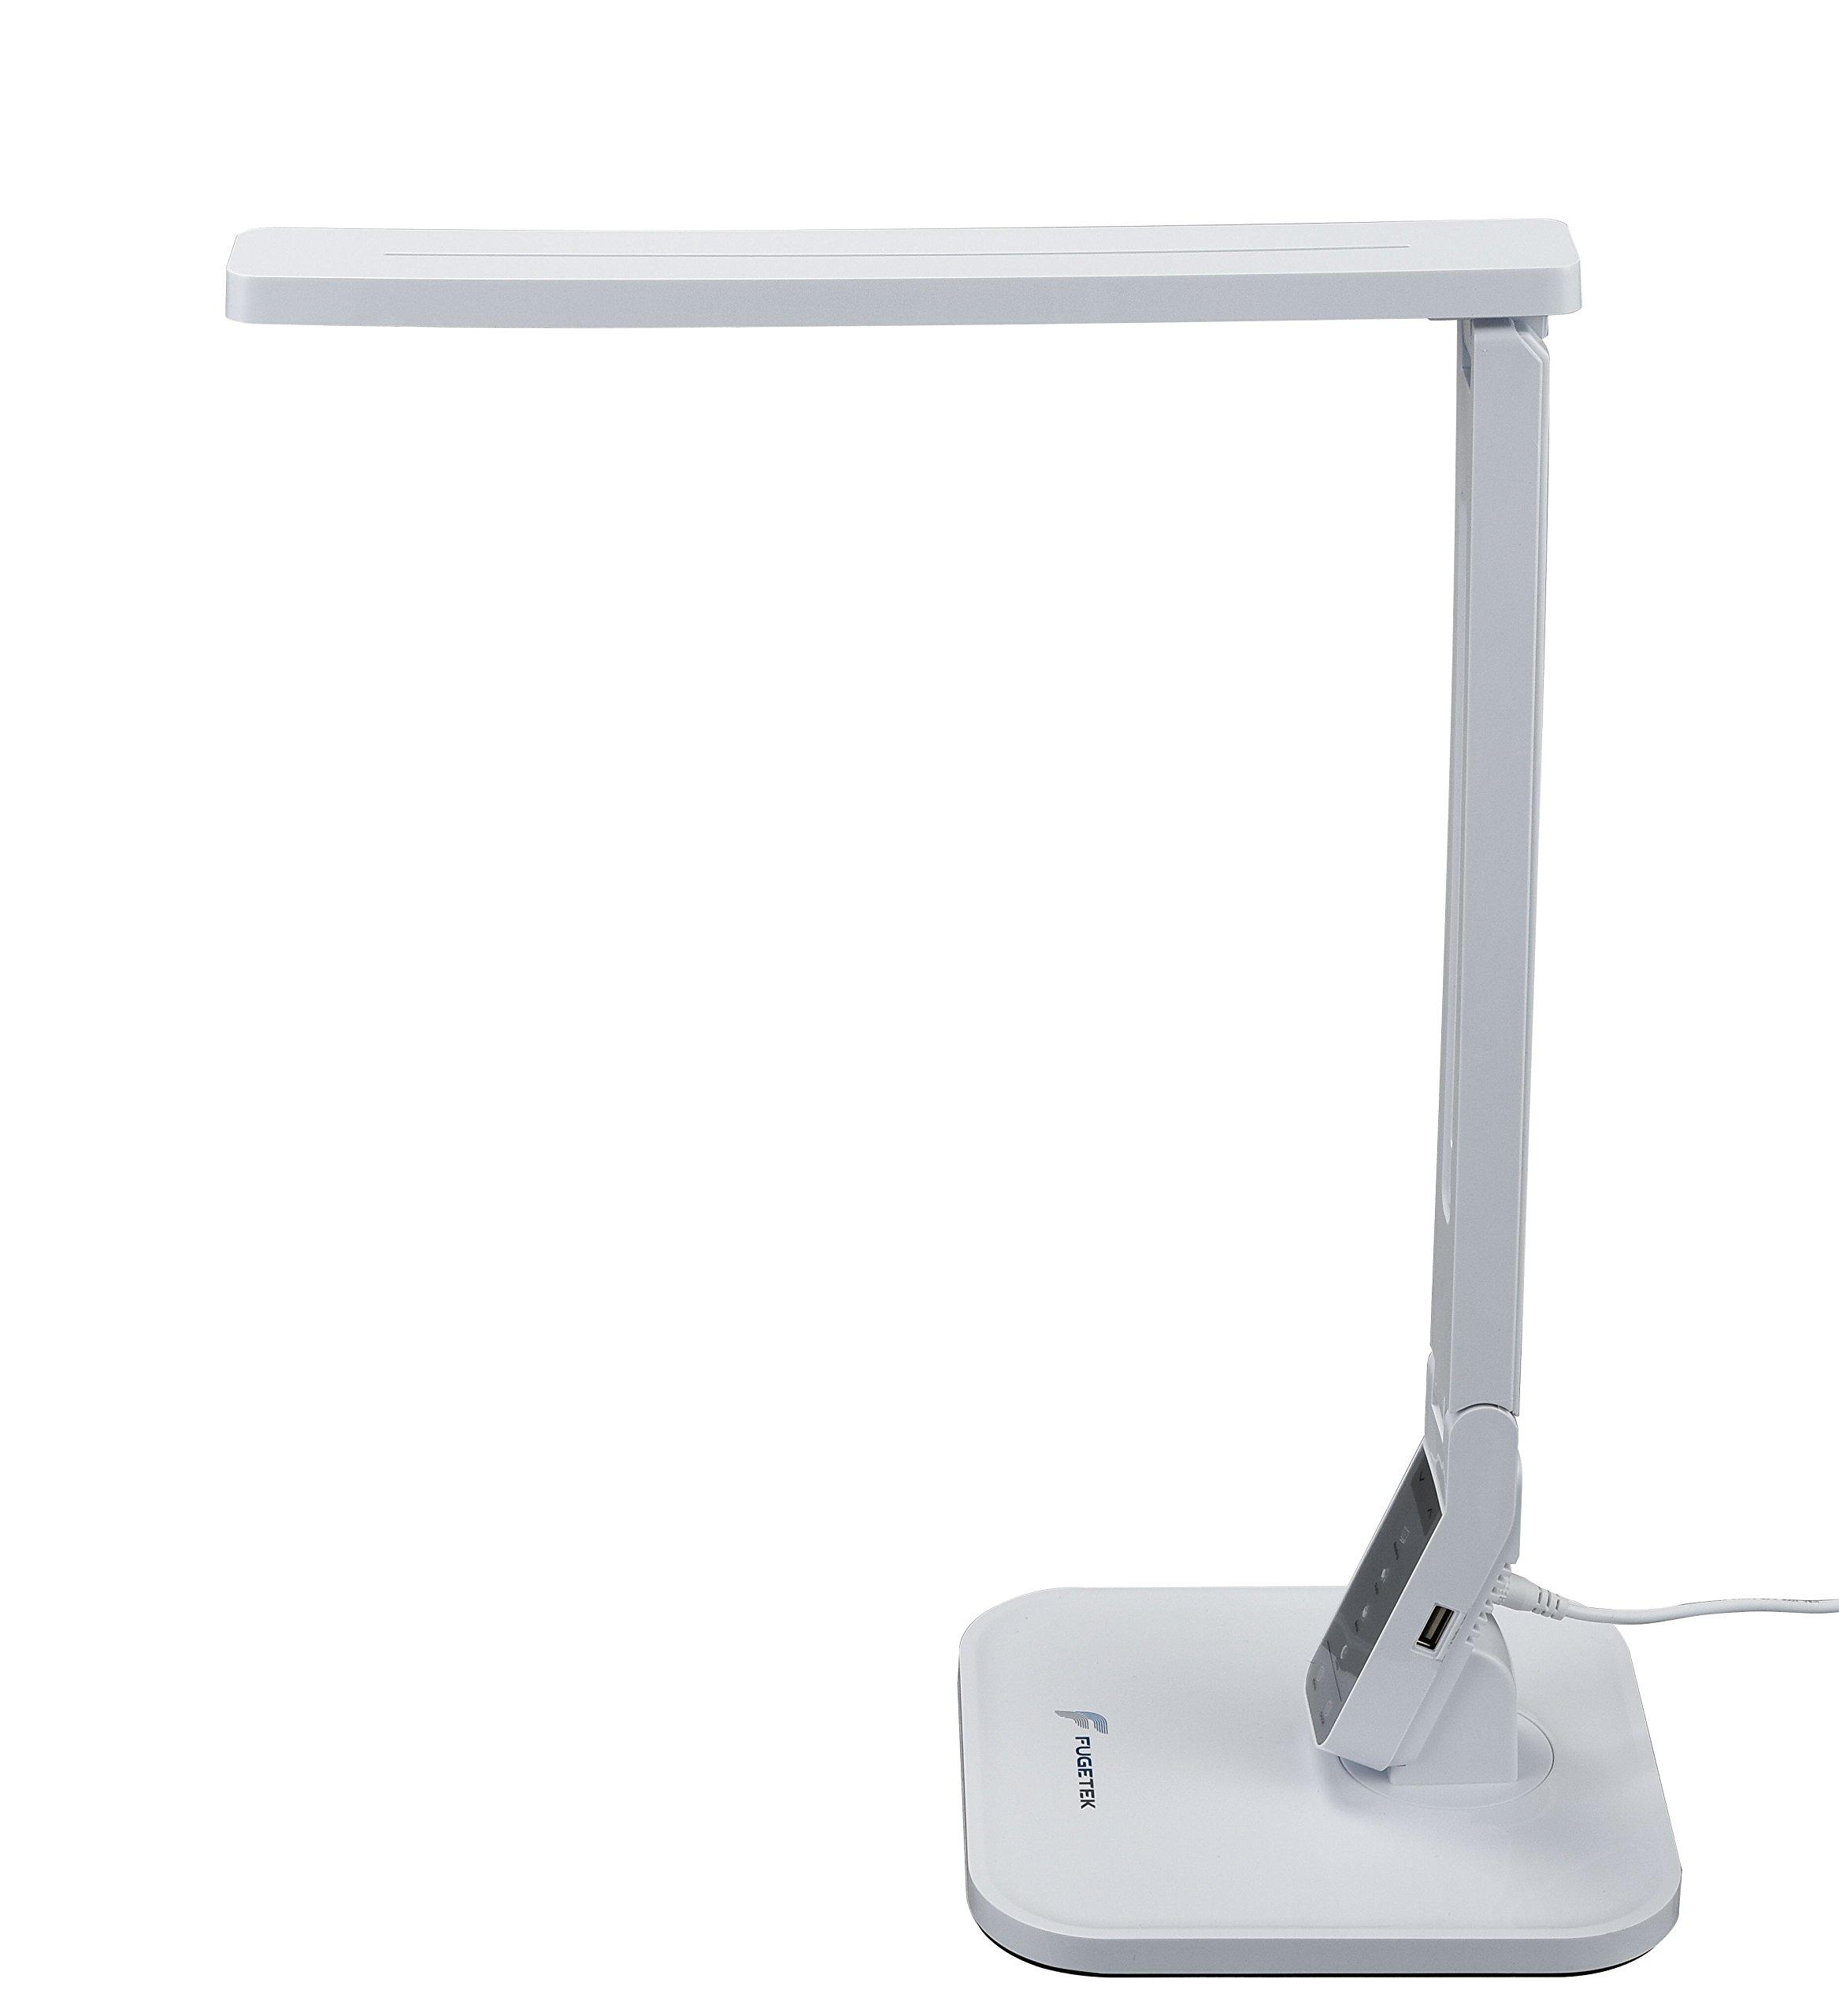 LED Desk Lamp 14W Fugetek FT-L798-W, 5-Level Dimmer, Touch Control Panel, 1-Hour Auto Timer, 5V/1A USB Charging Port - (White)